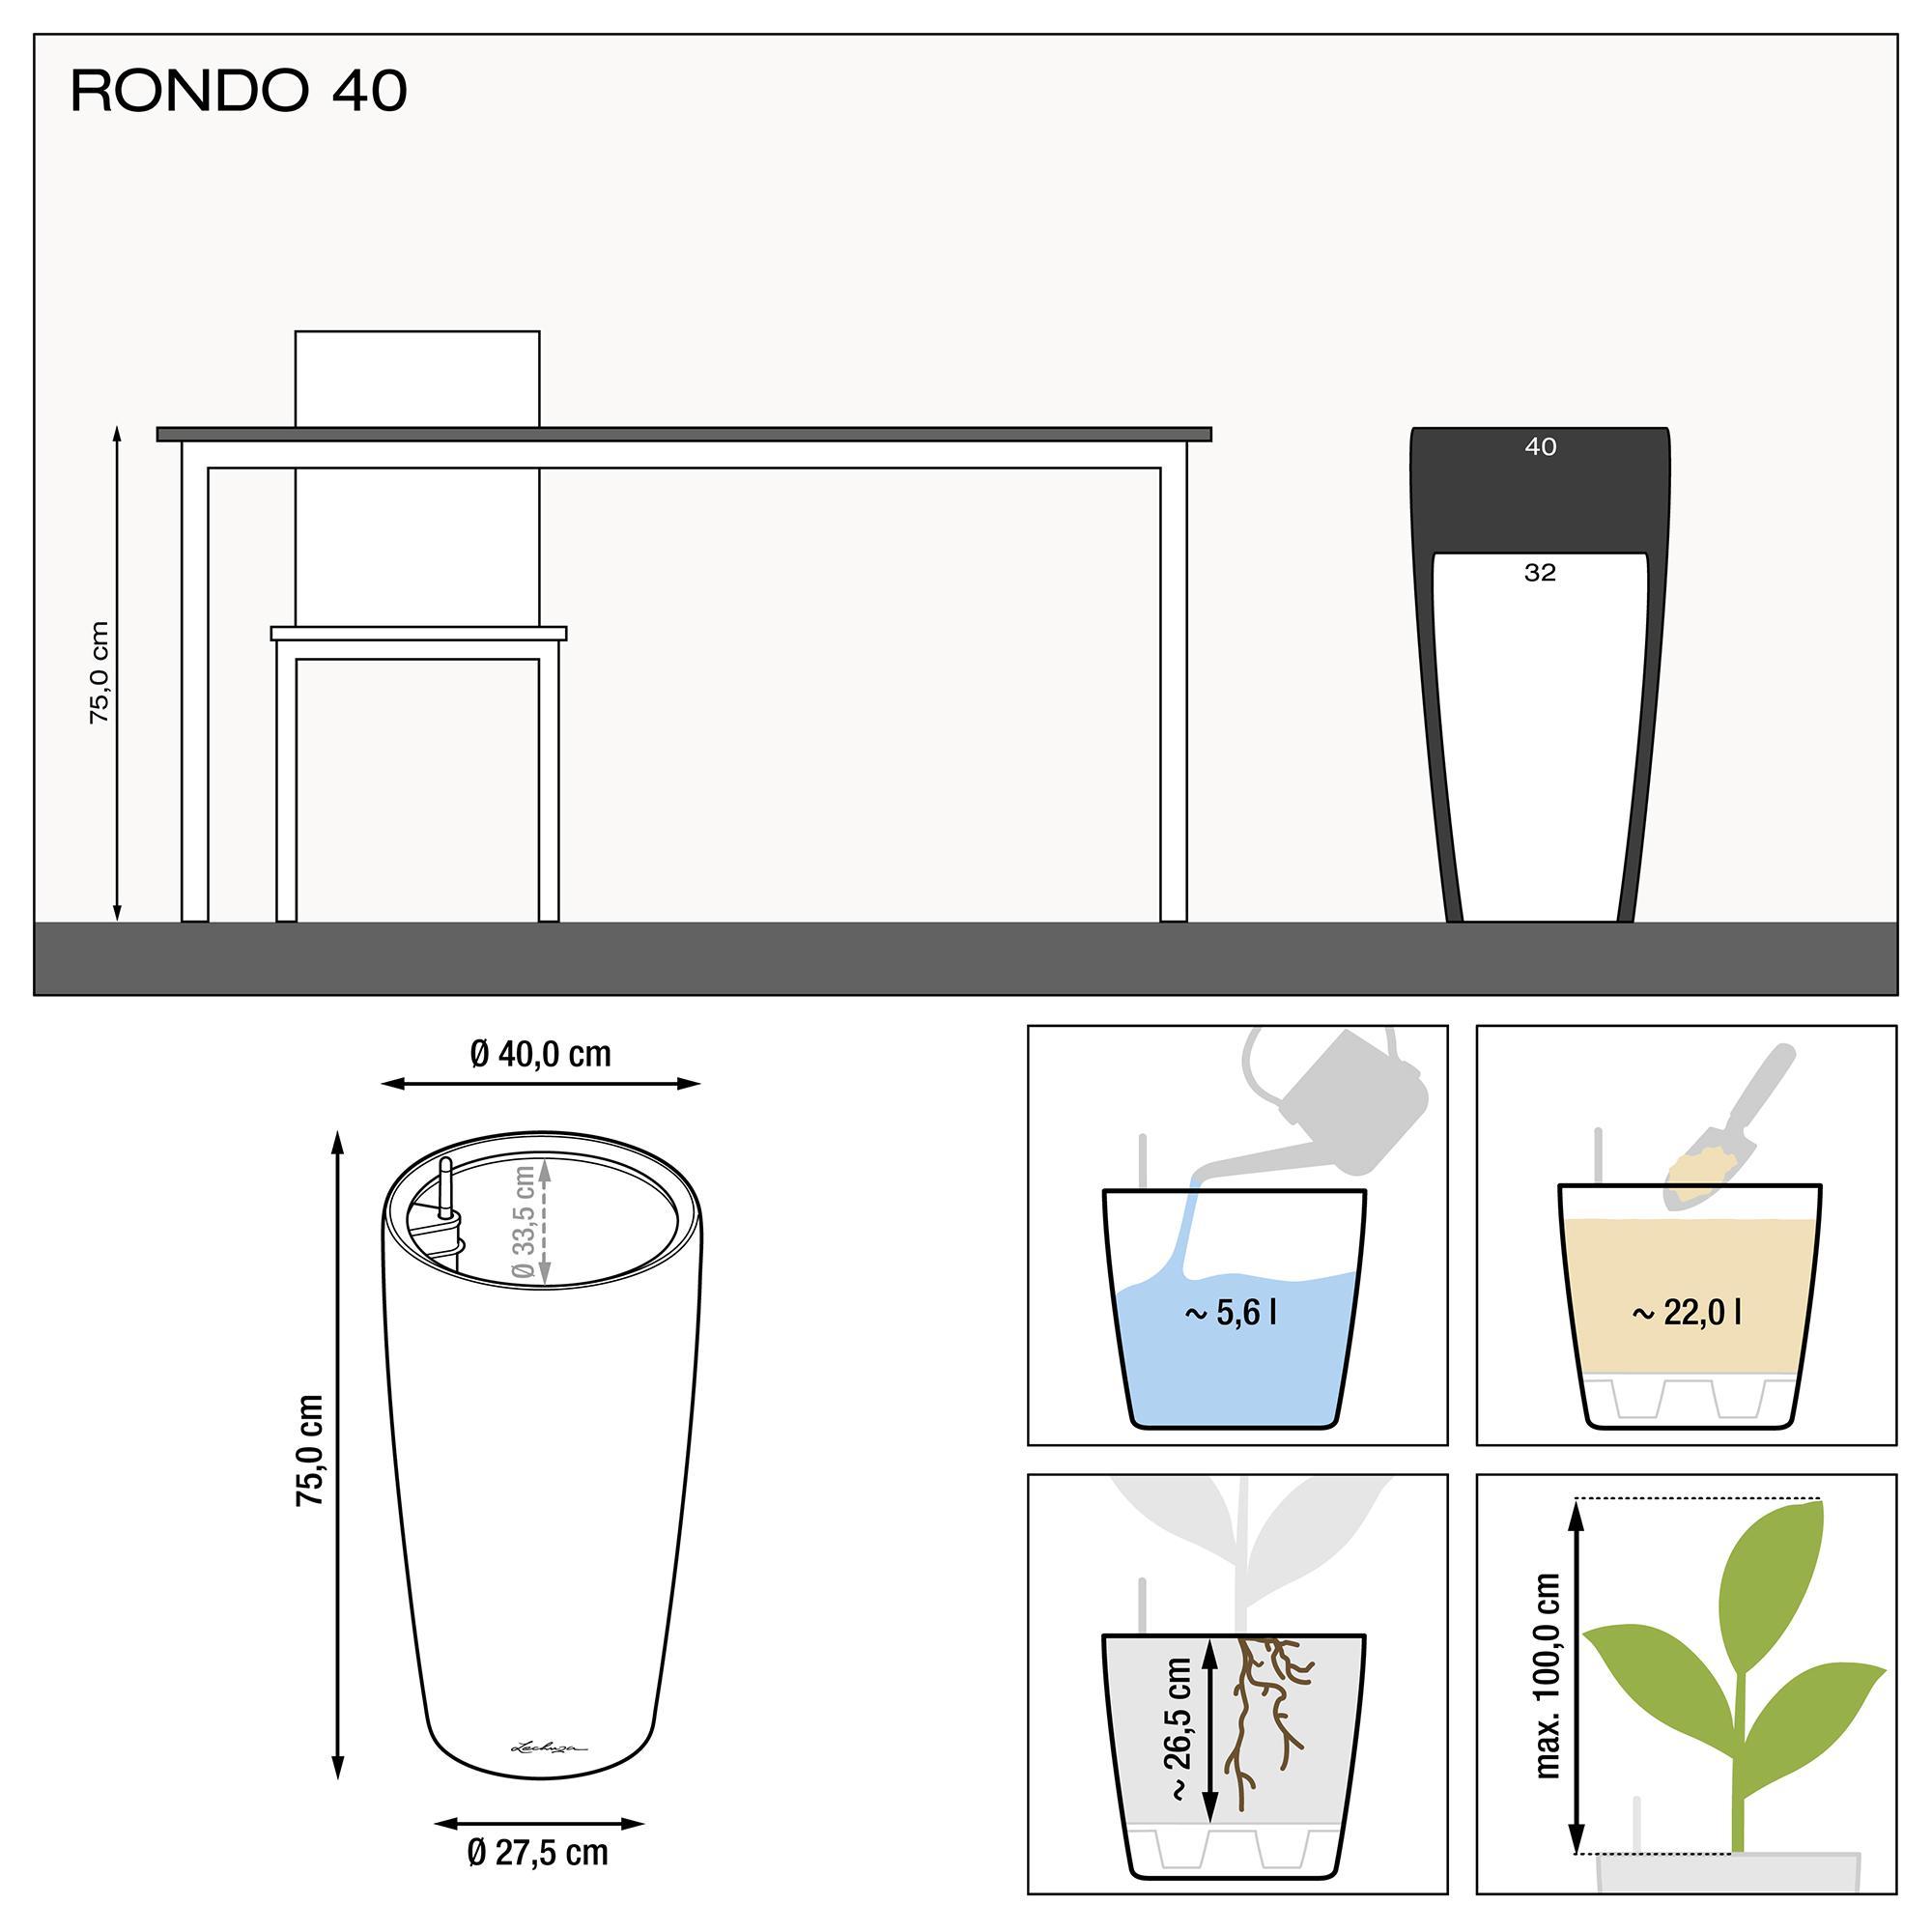 medium resolution of le rondo40 product addi nz le rondo40 product addi 01 le rondo40 product addi 02 le rondo product addi 01 le rondo product addi 02